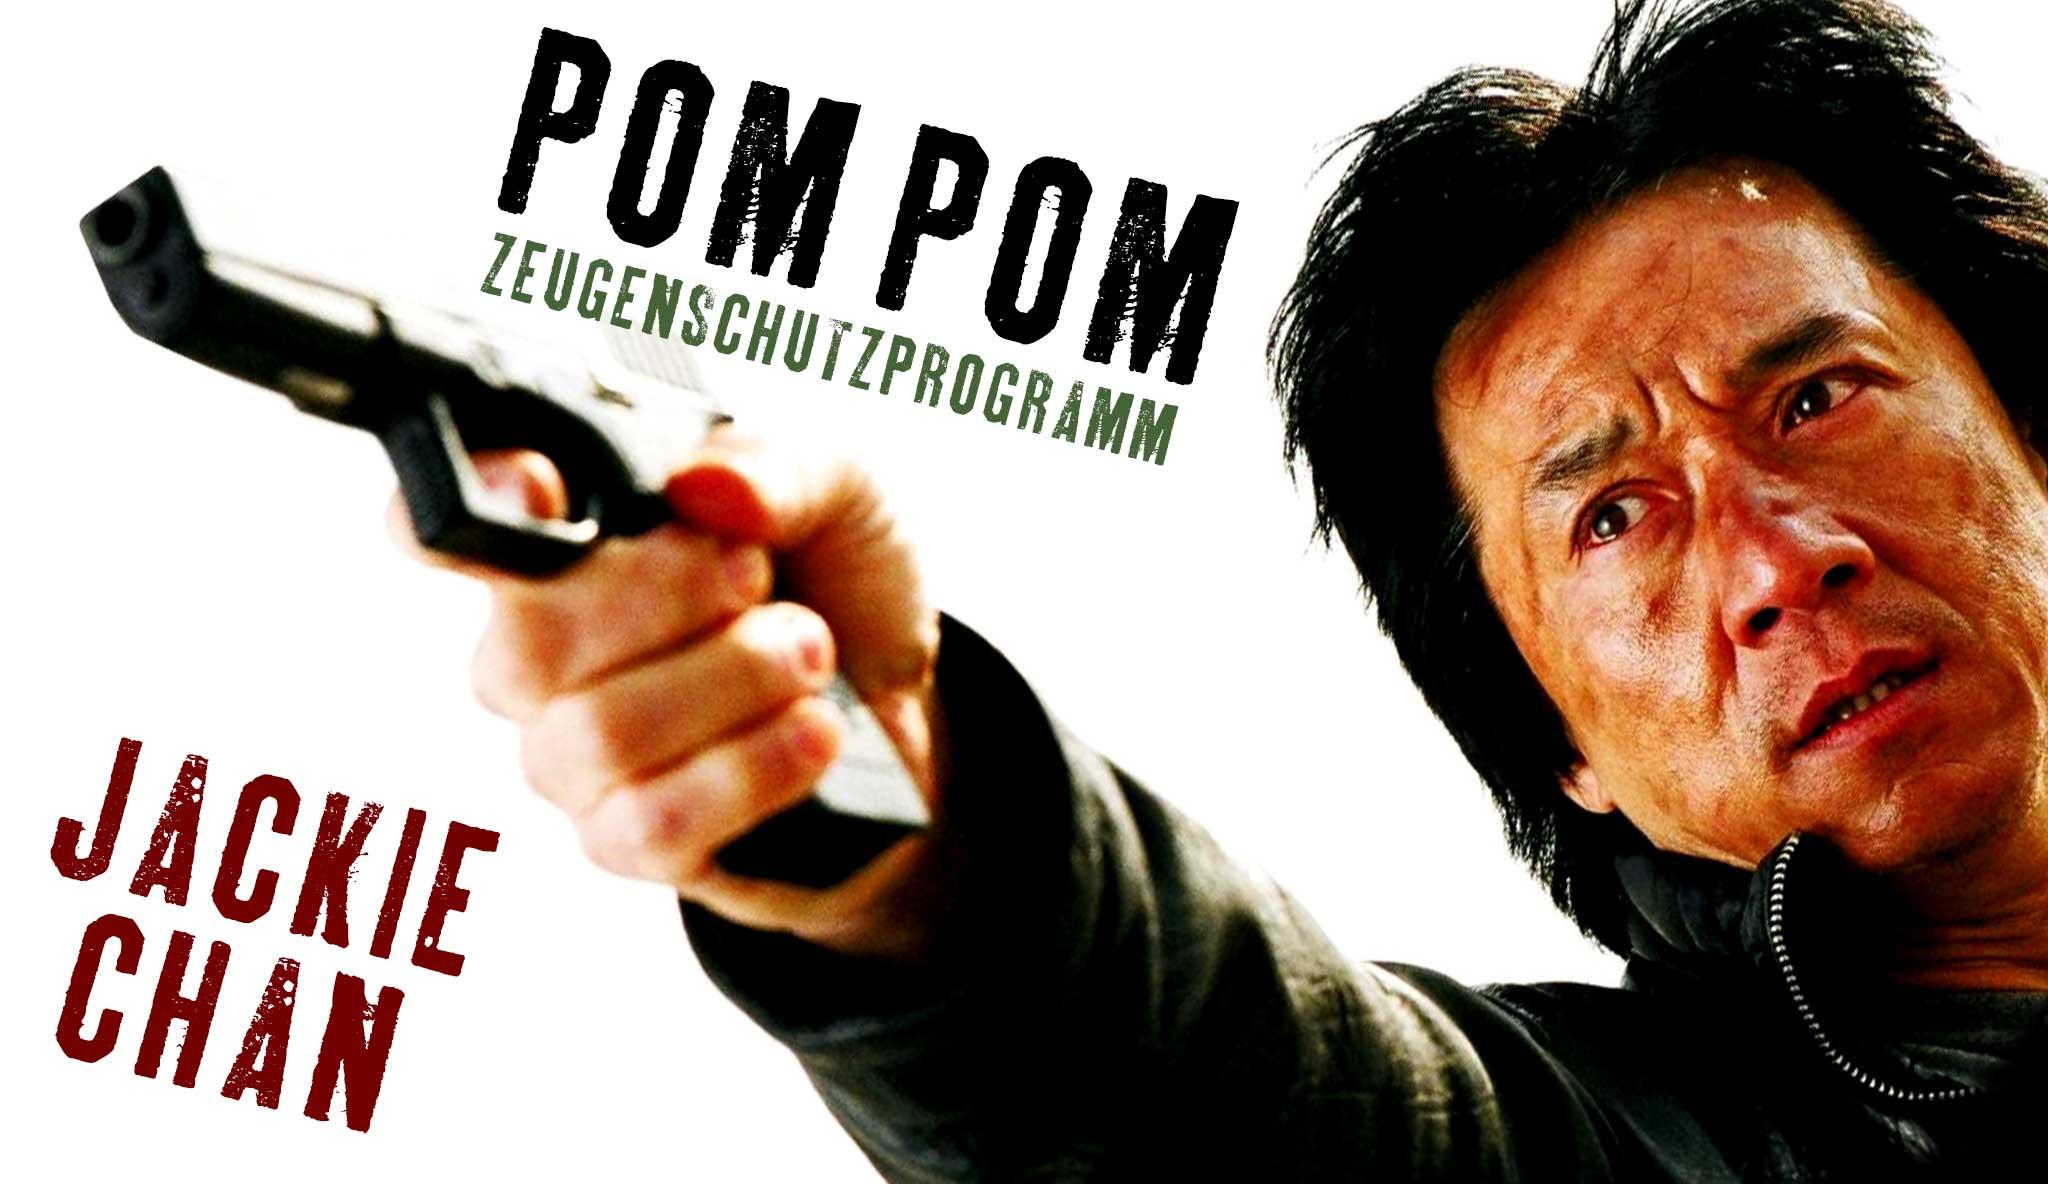 pom-pom-zeugenschutzprogramm\header.jpg